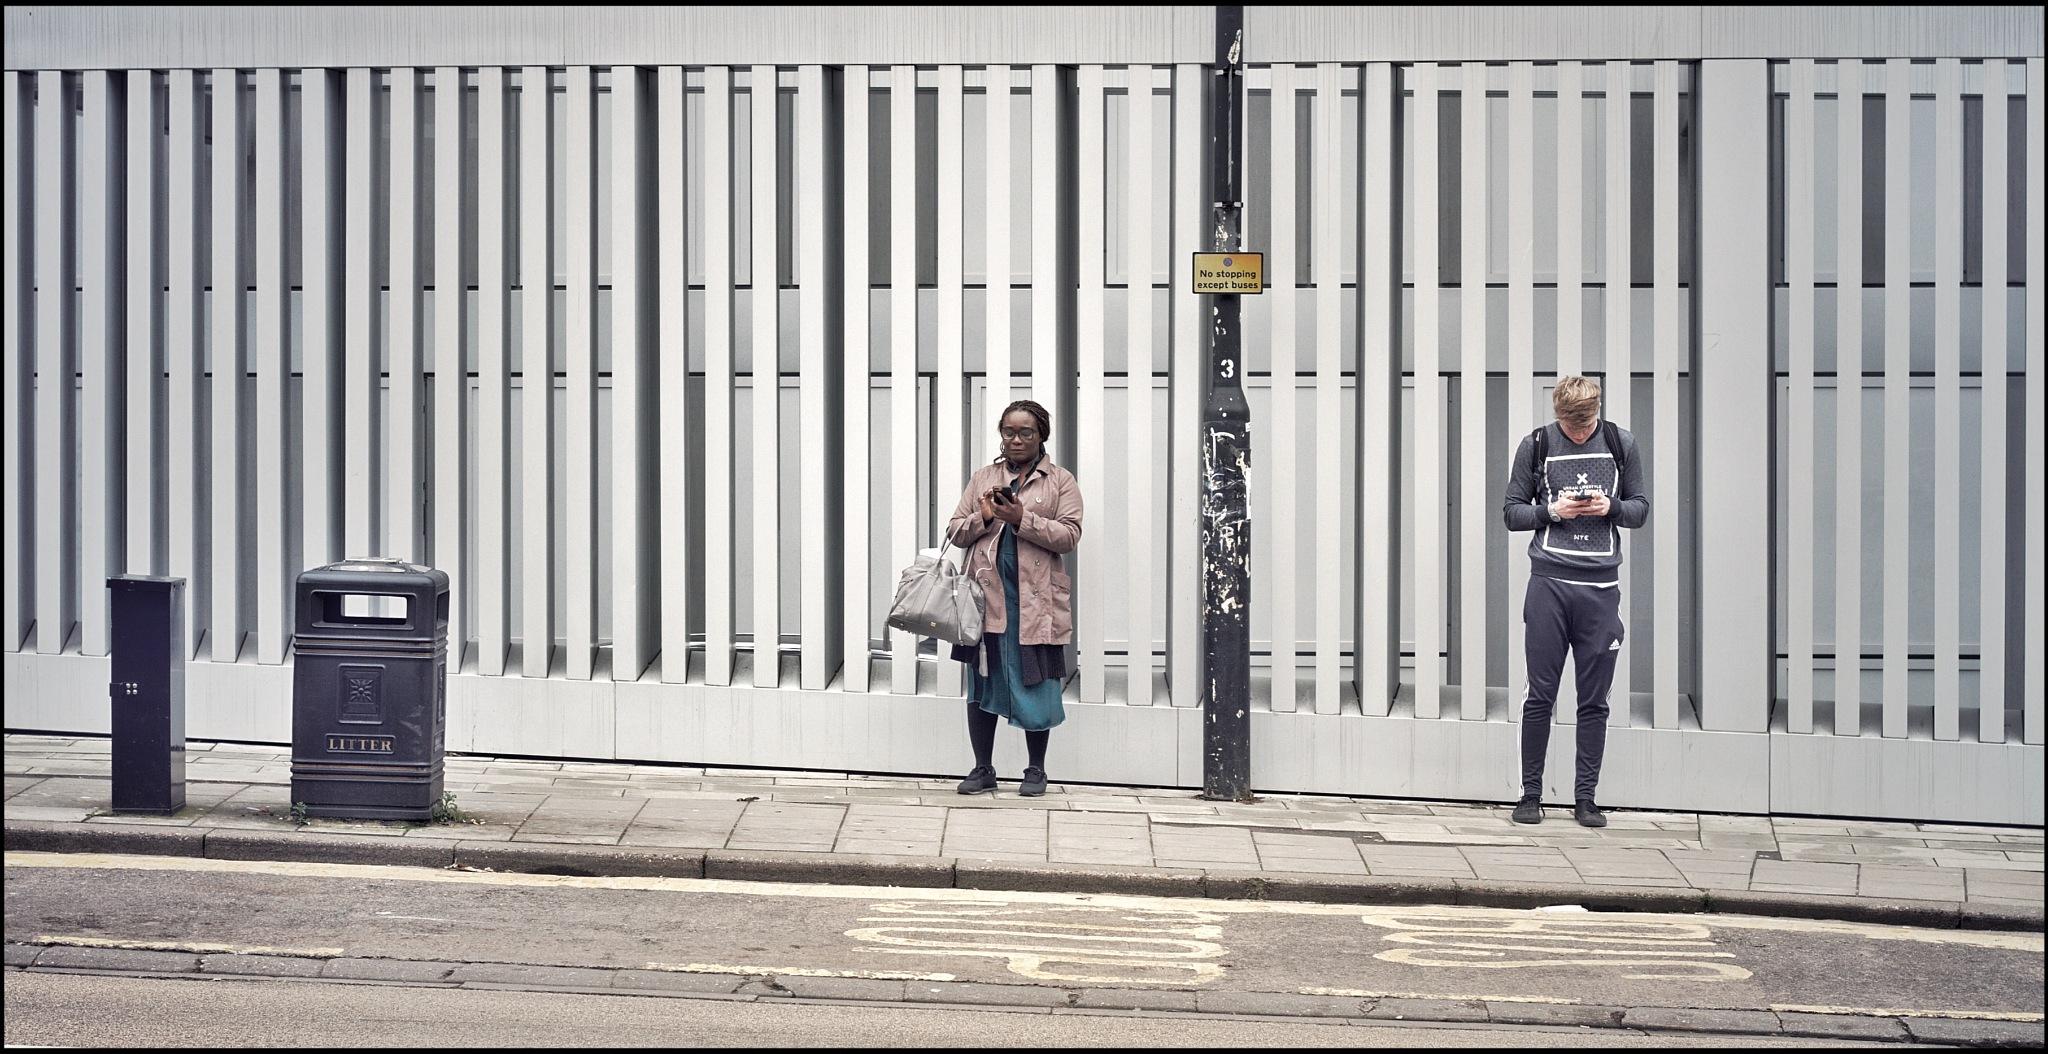 lines by John John McLane Freelance photographer